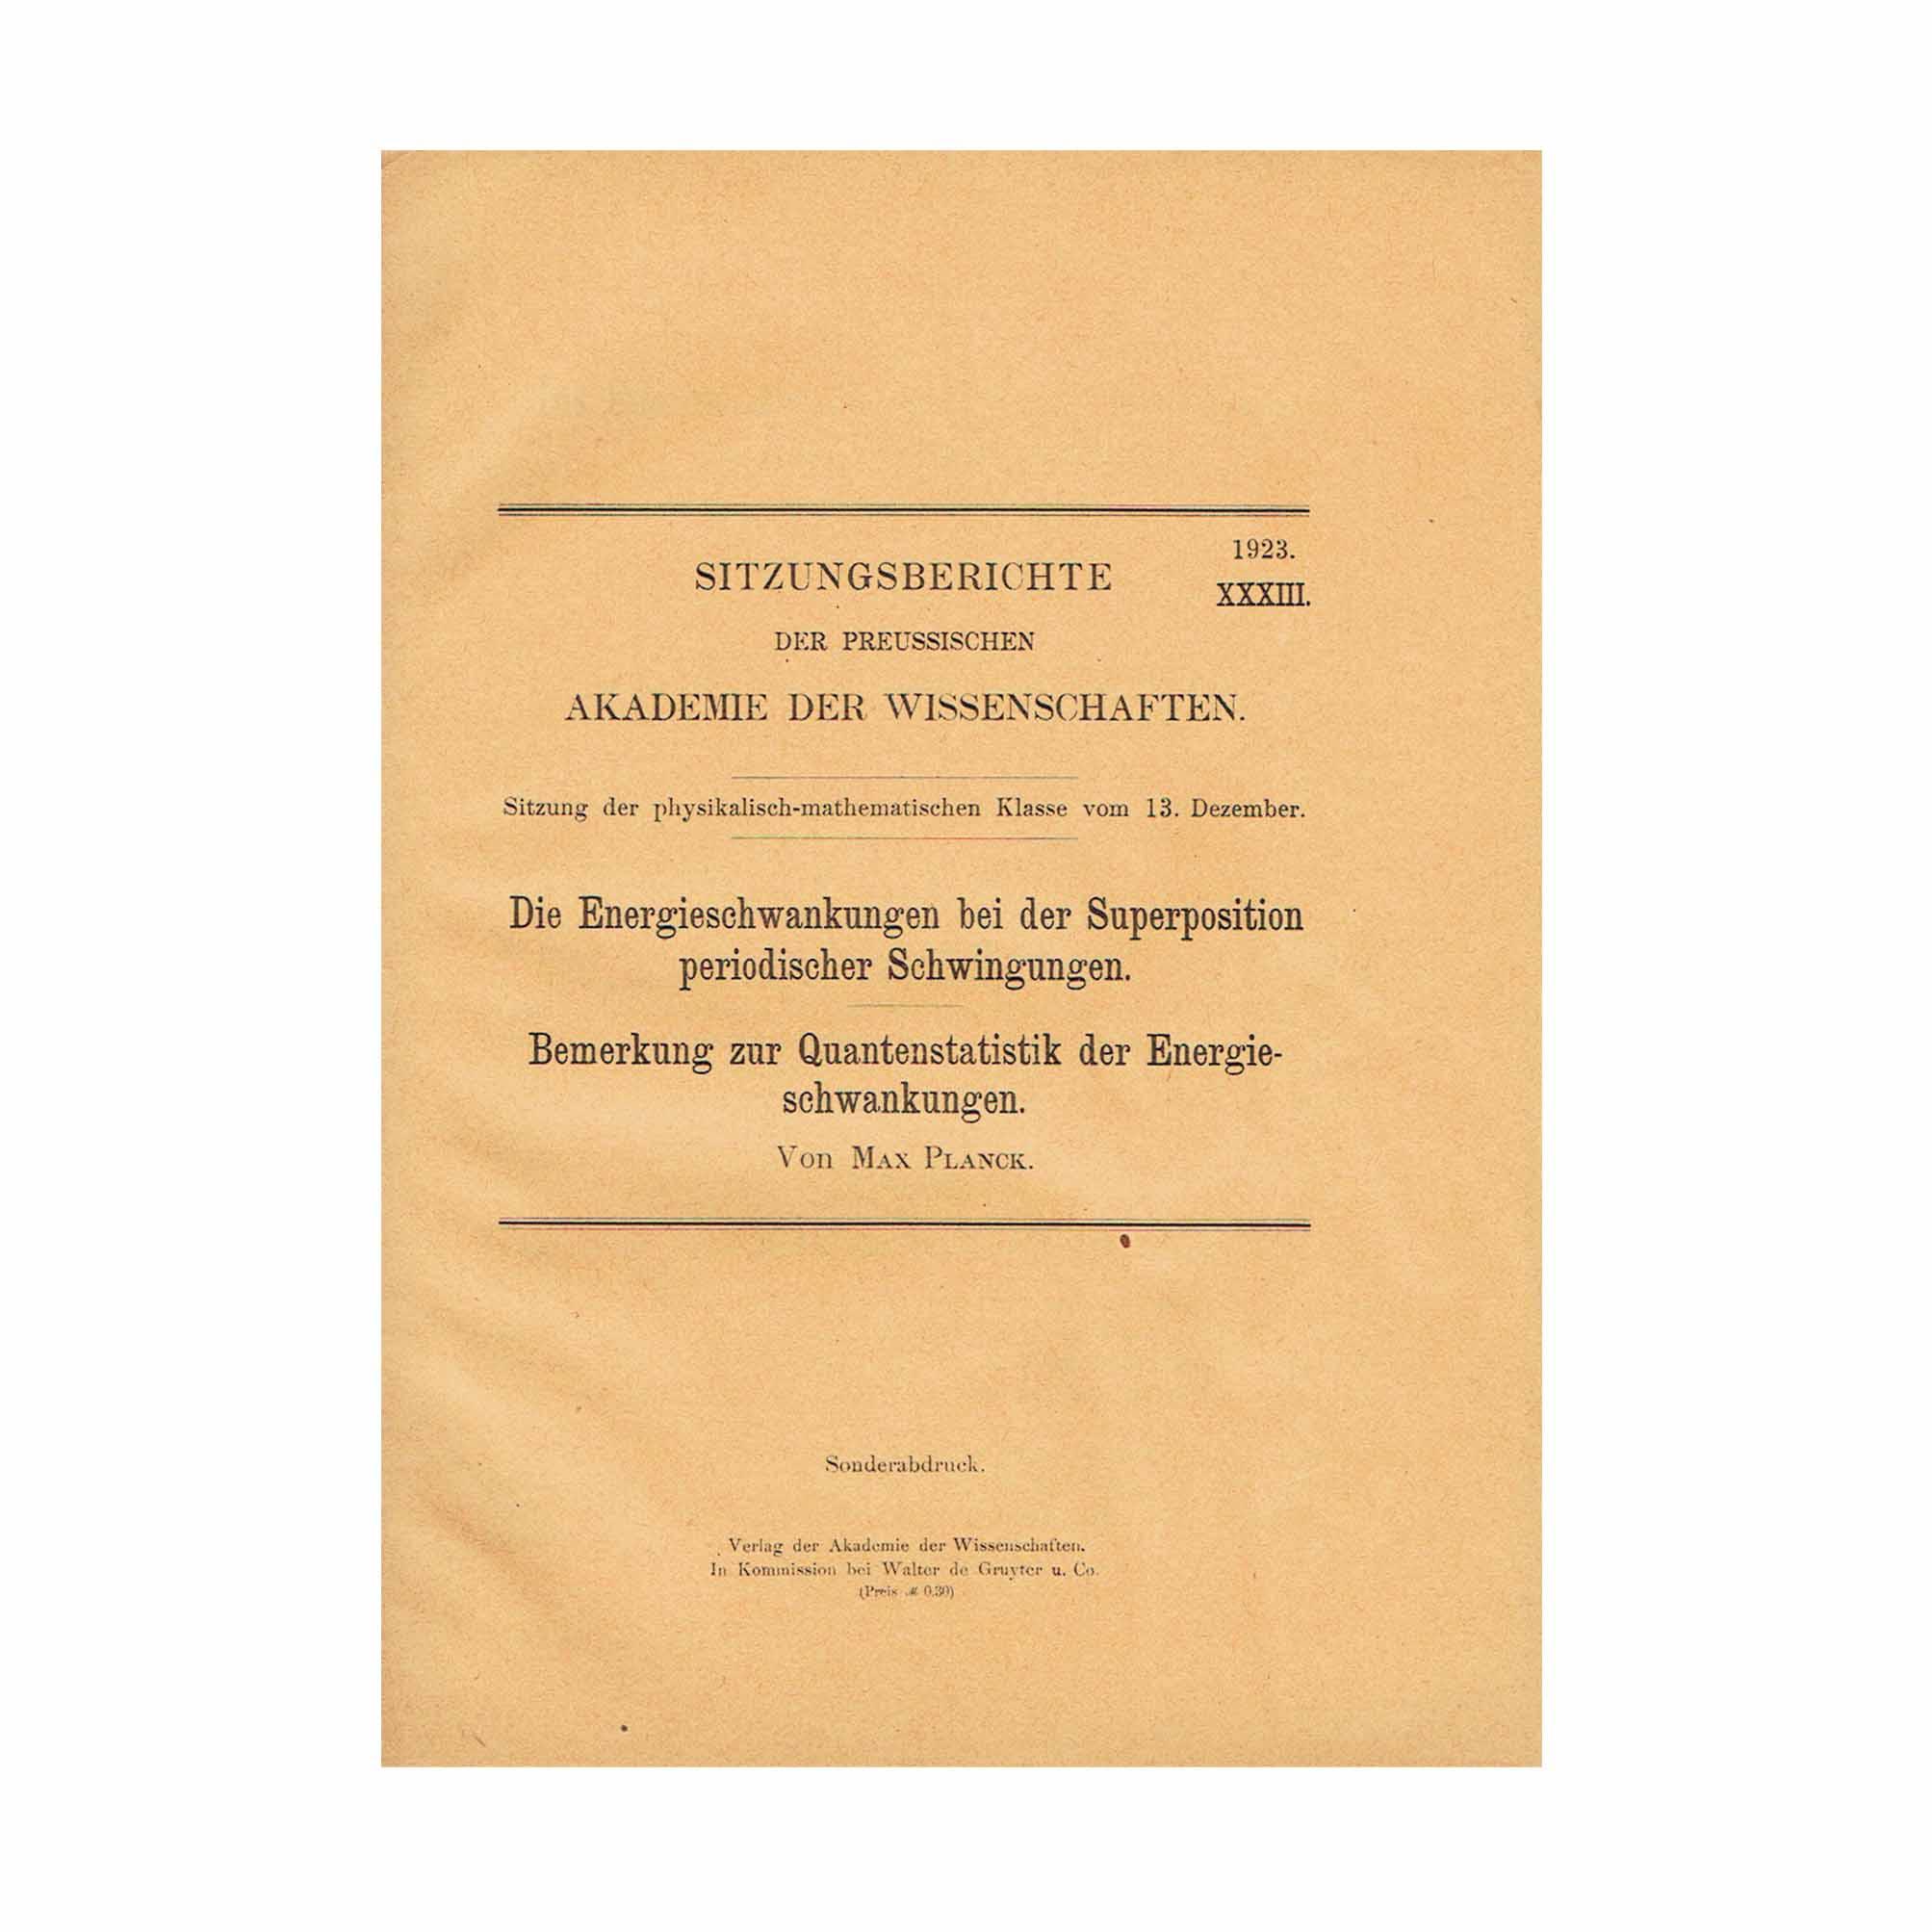 5823K-Planck-Energieschwankungen-1923-Front-Cover-N.jpeg